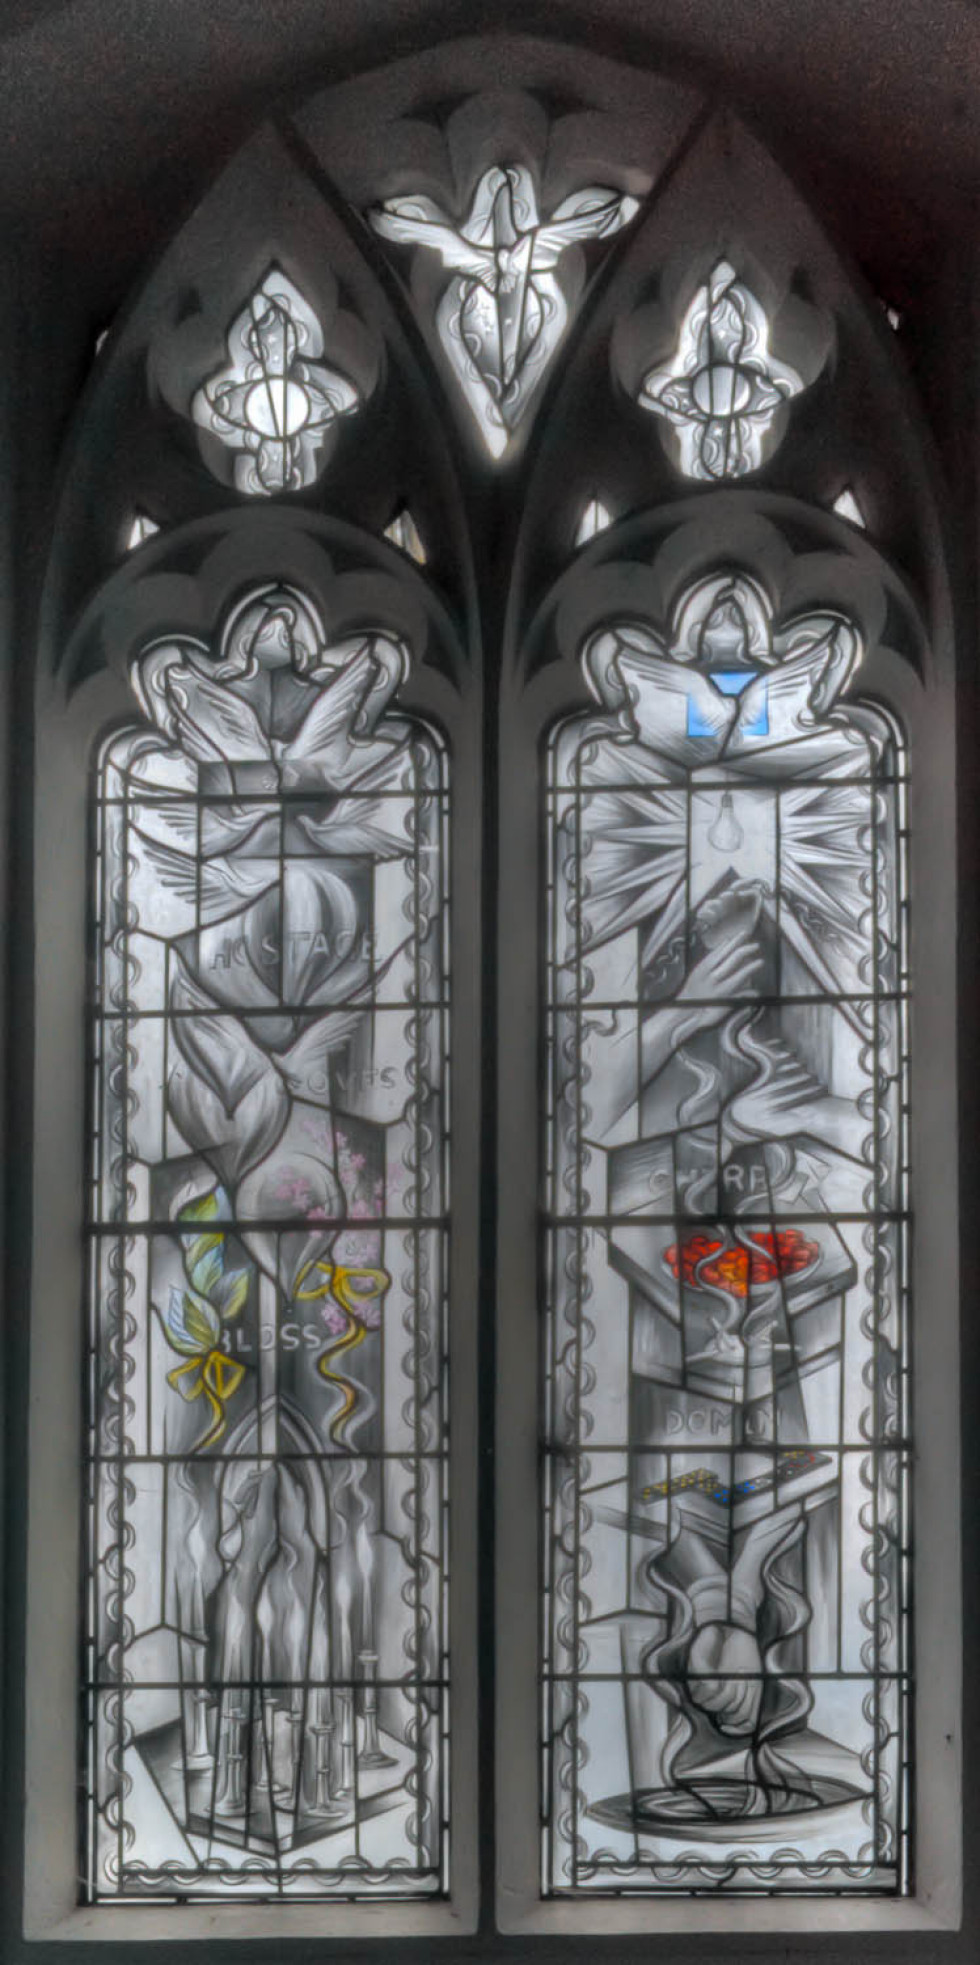 The Captivity Window